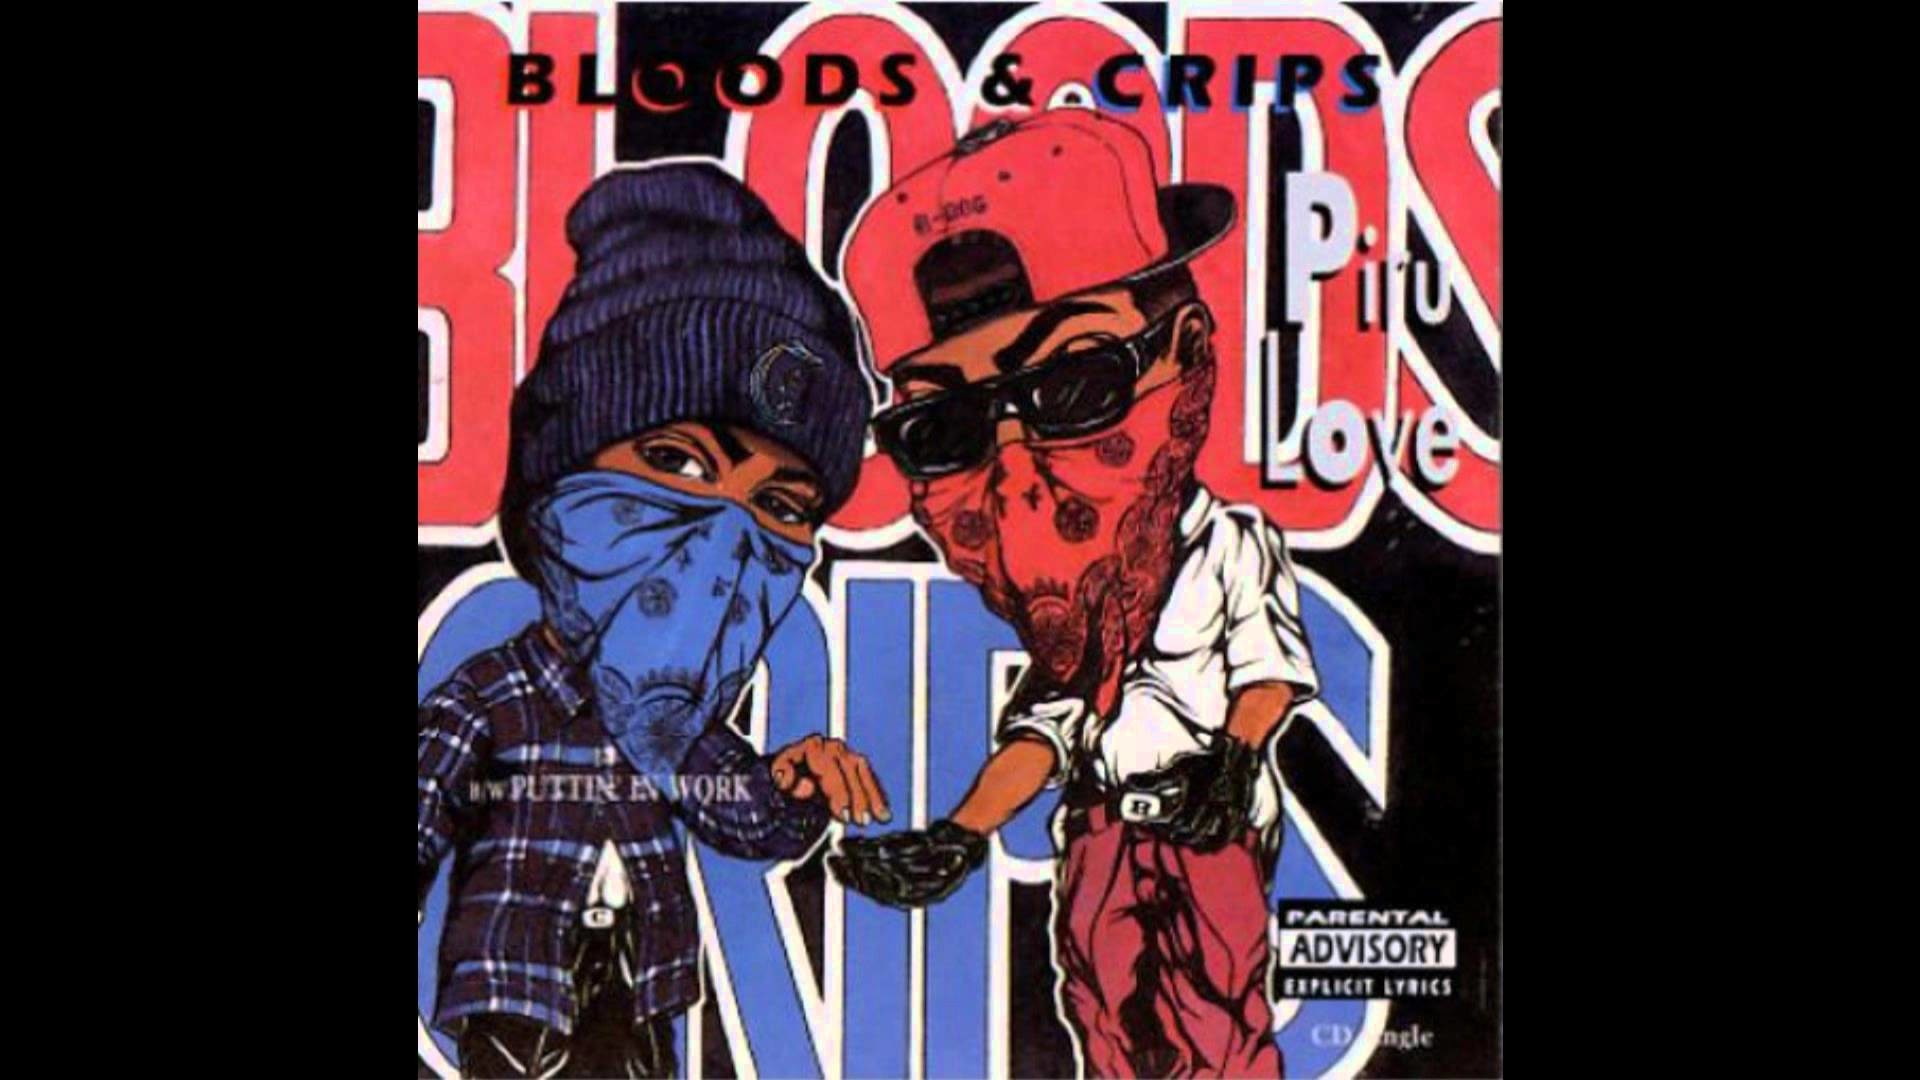 Bloods & Crips – Piru Love (Original Version)